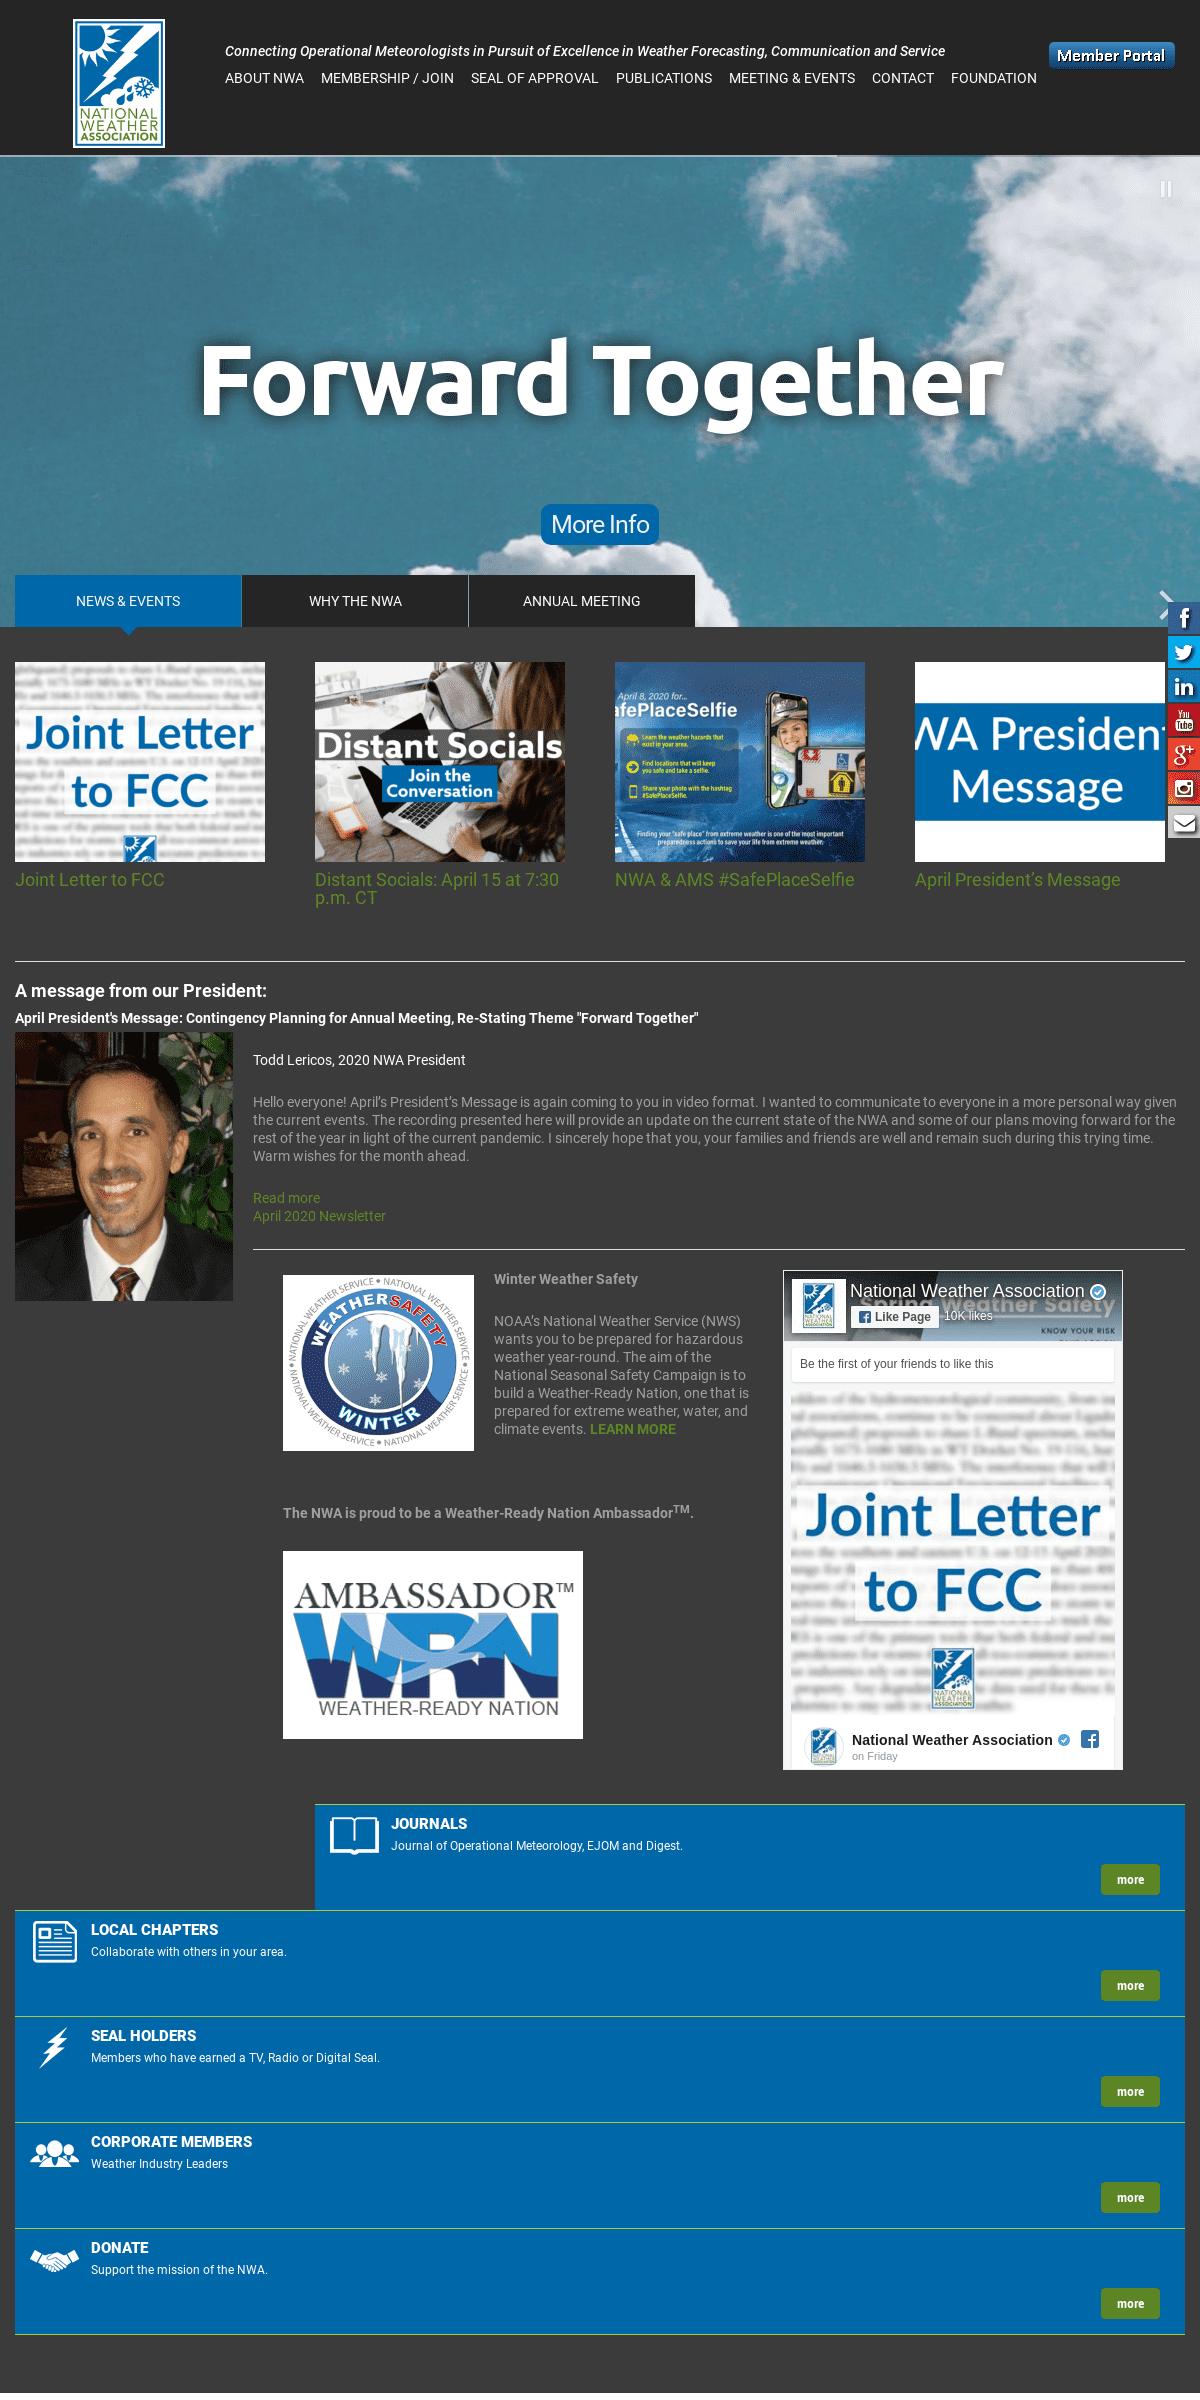 National Weather Association -